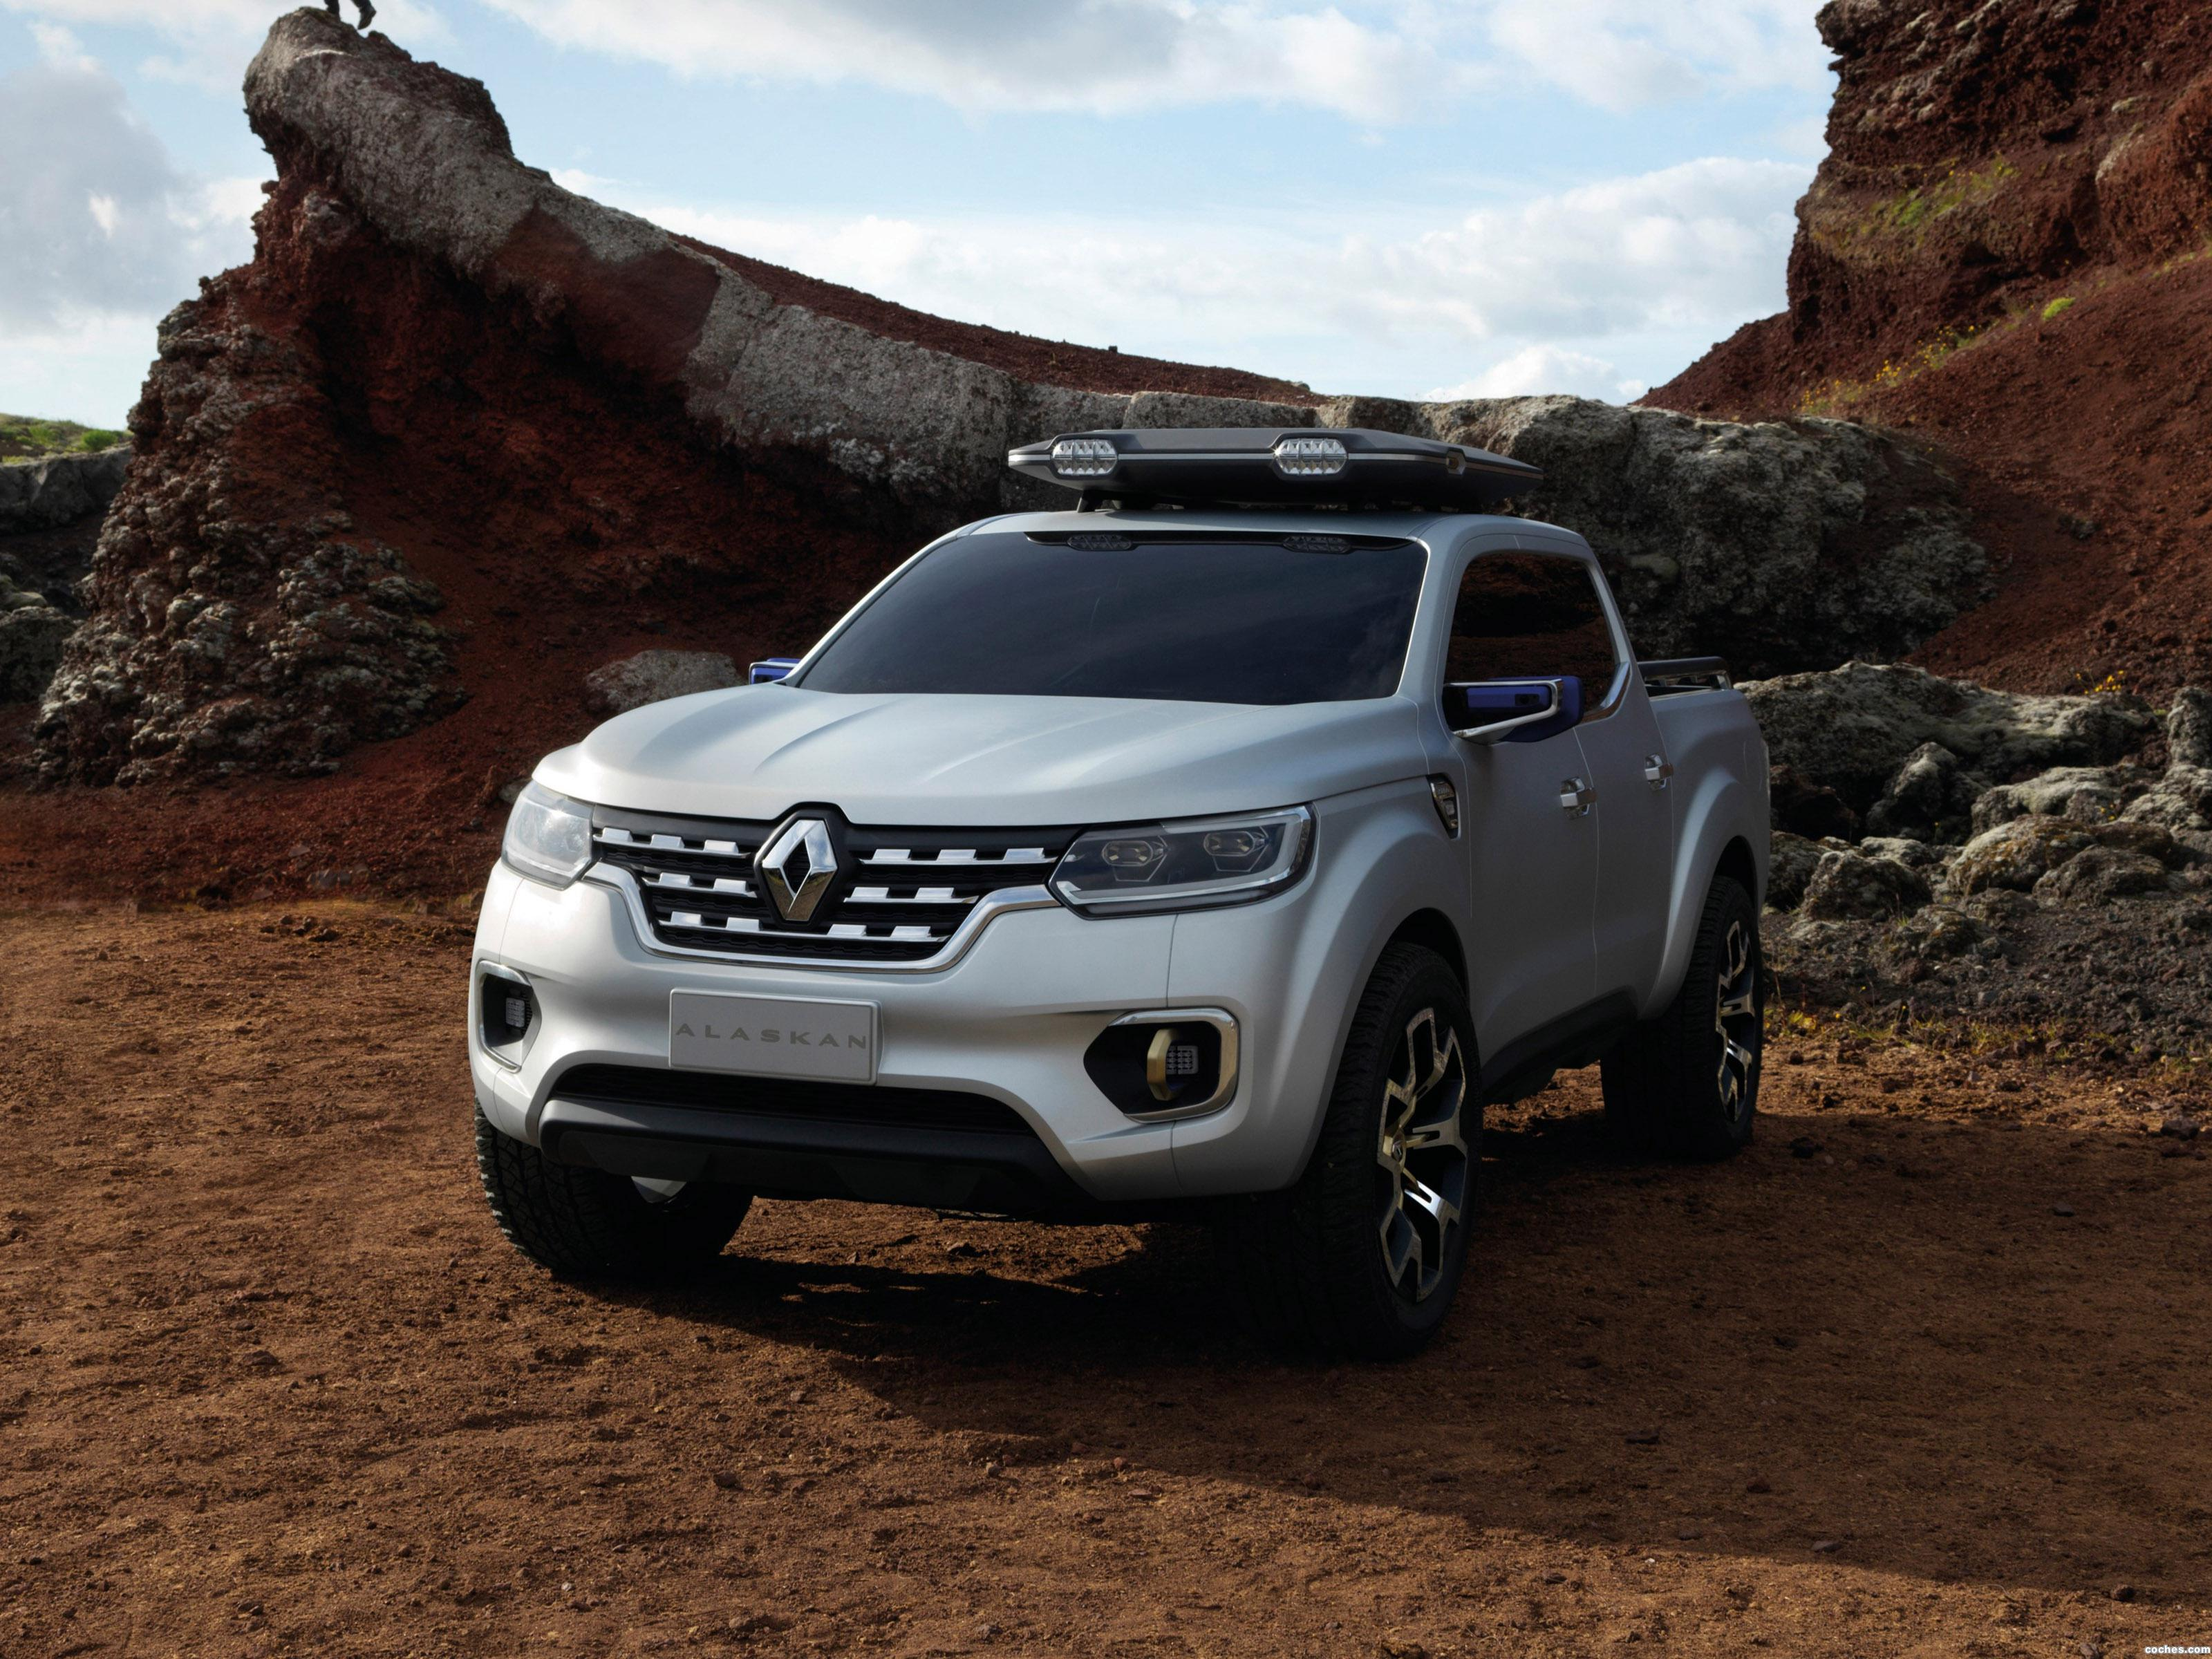 Foto 0 de Renault Alaskan Concept 2015